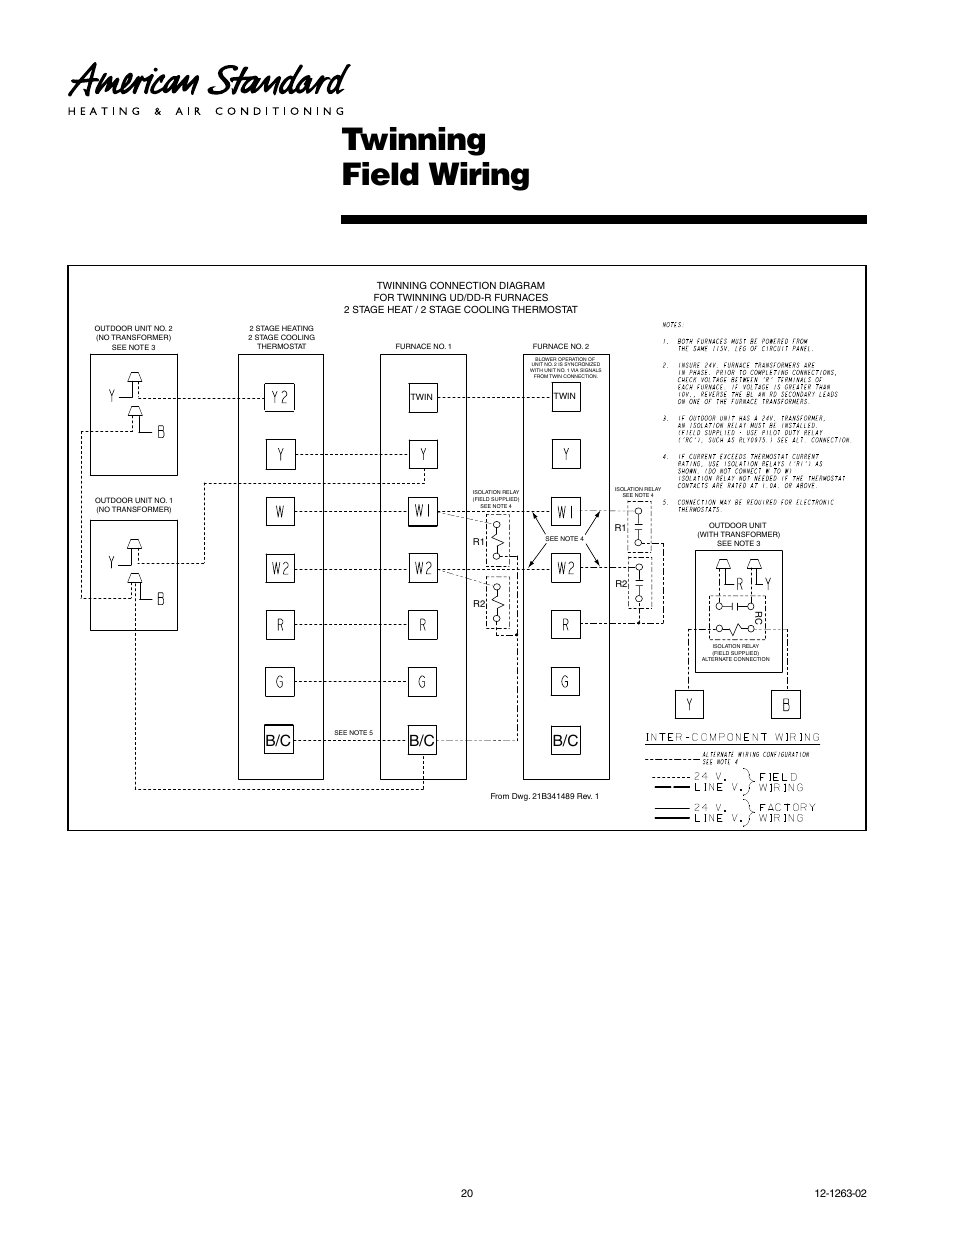 Twinning Field Wiring American Standard Freedom 80 User